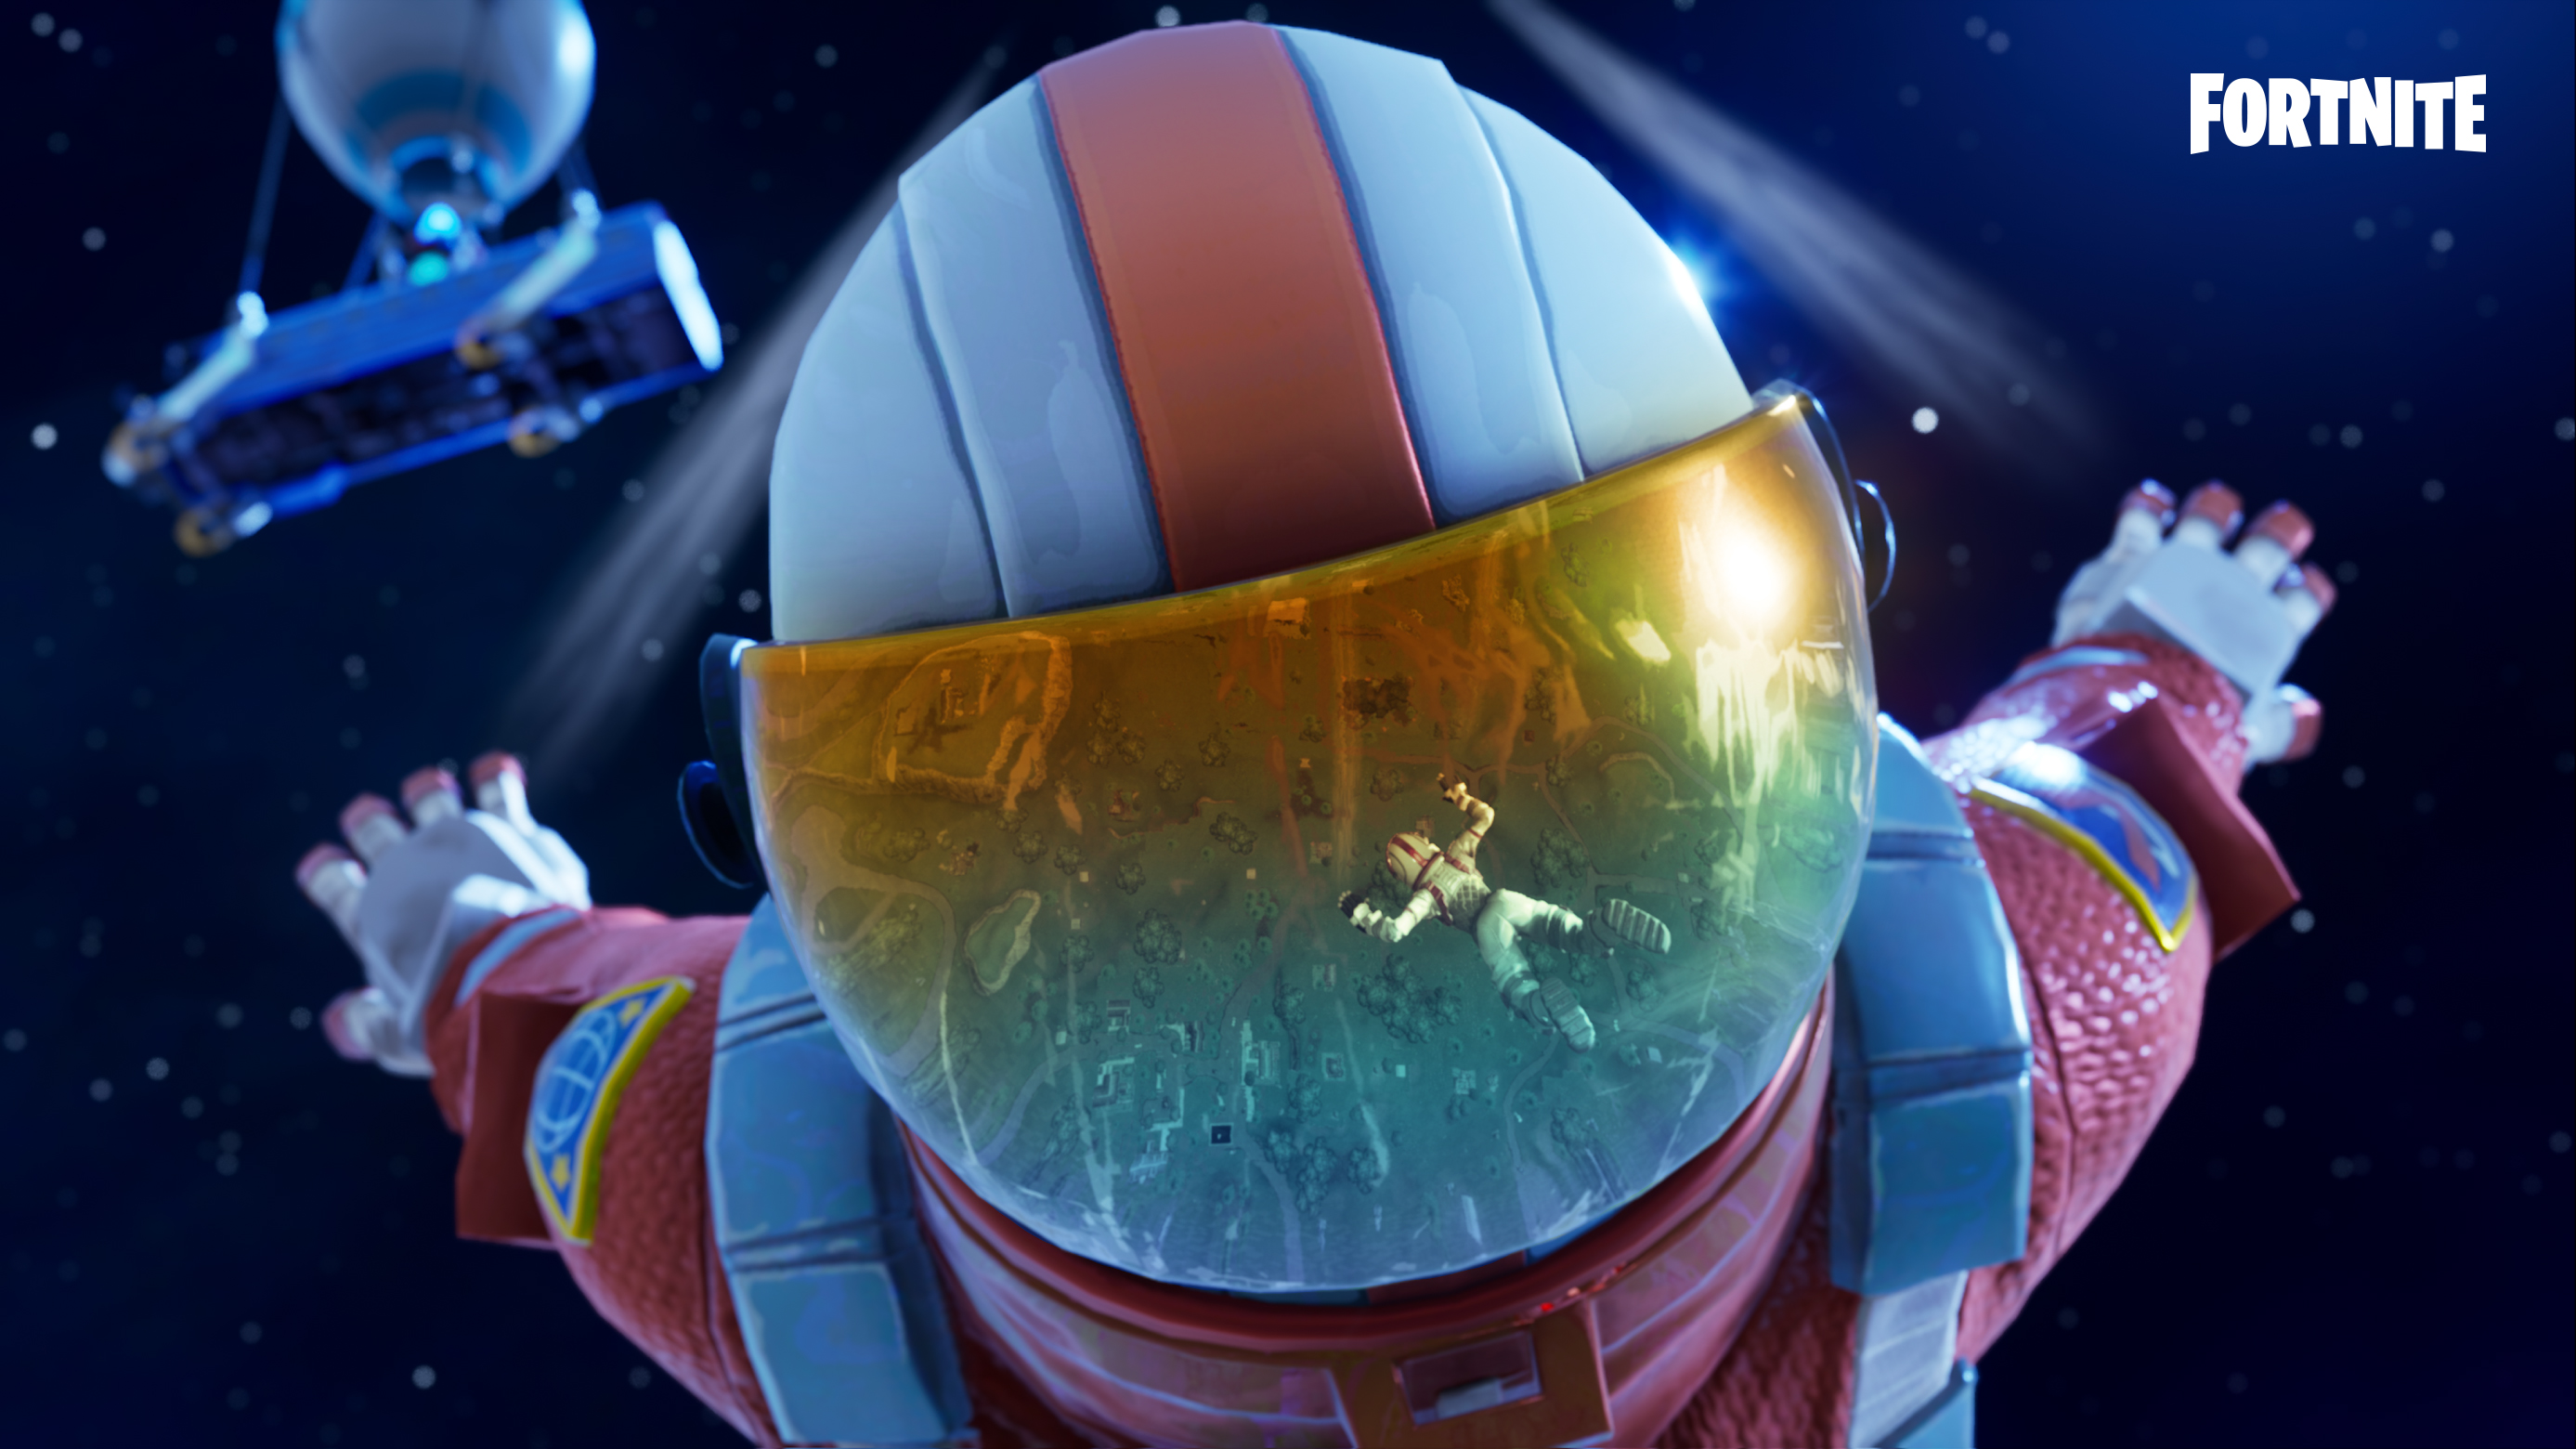 Astronaut Battle Pass Season 3 HD Wallpaper Background Image 2774x1560